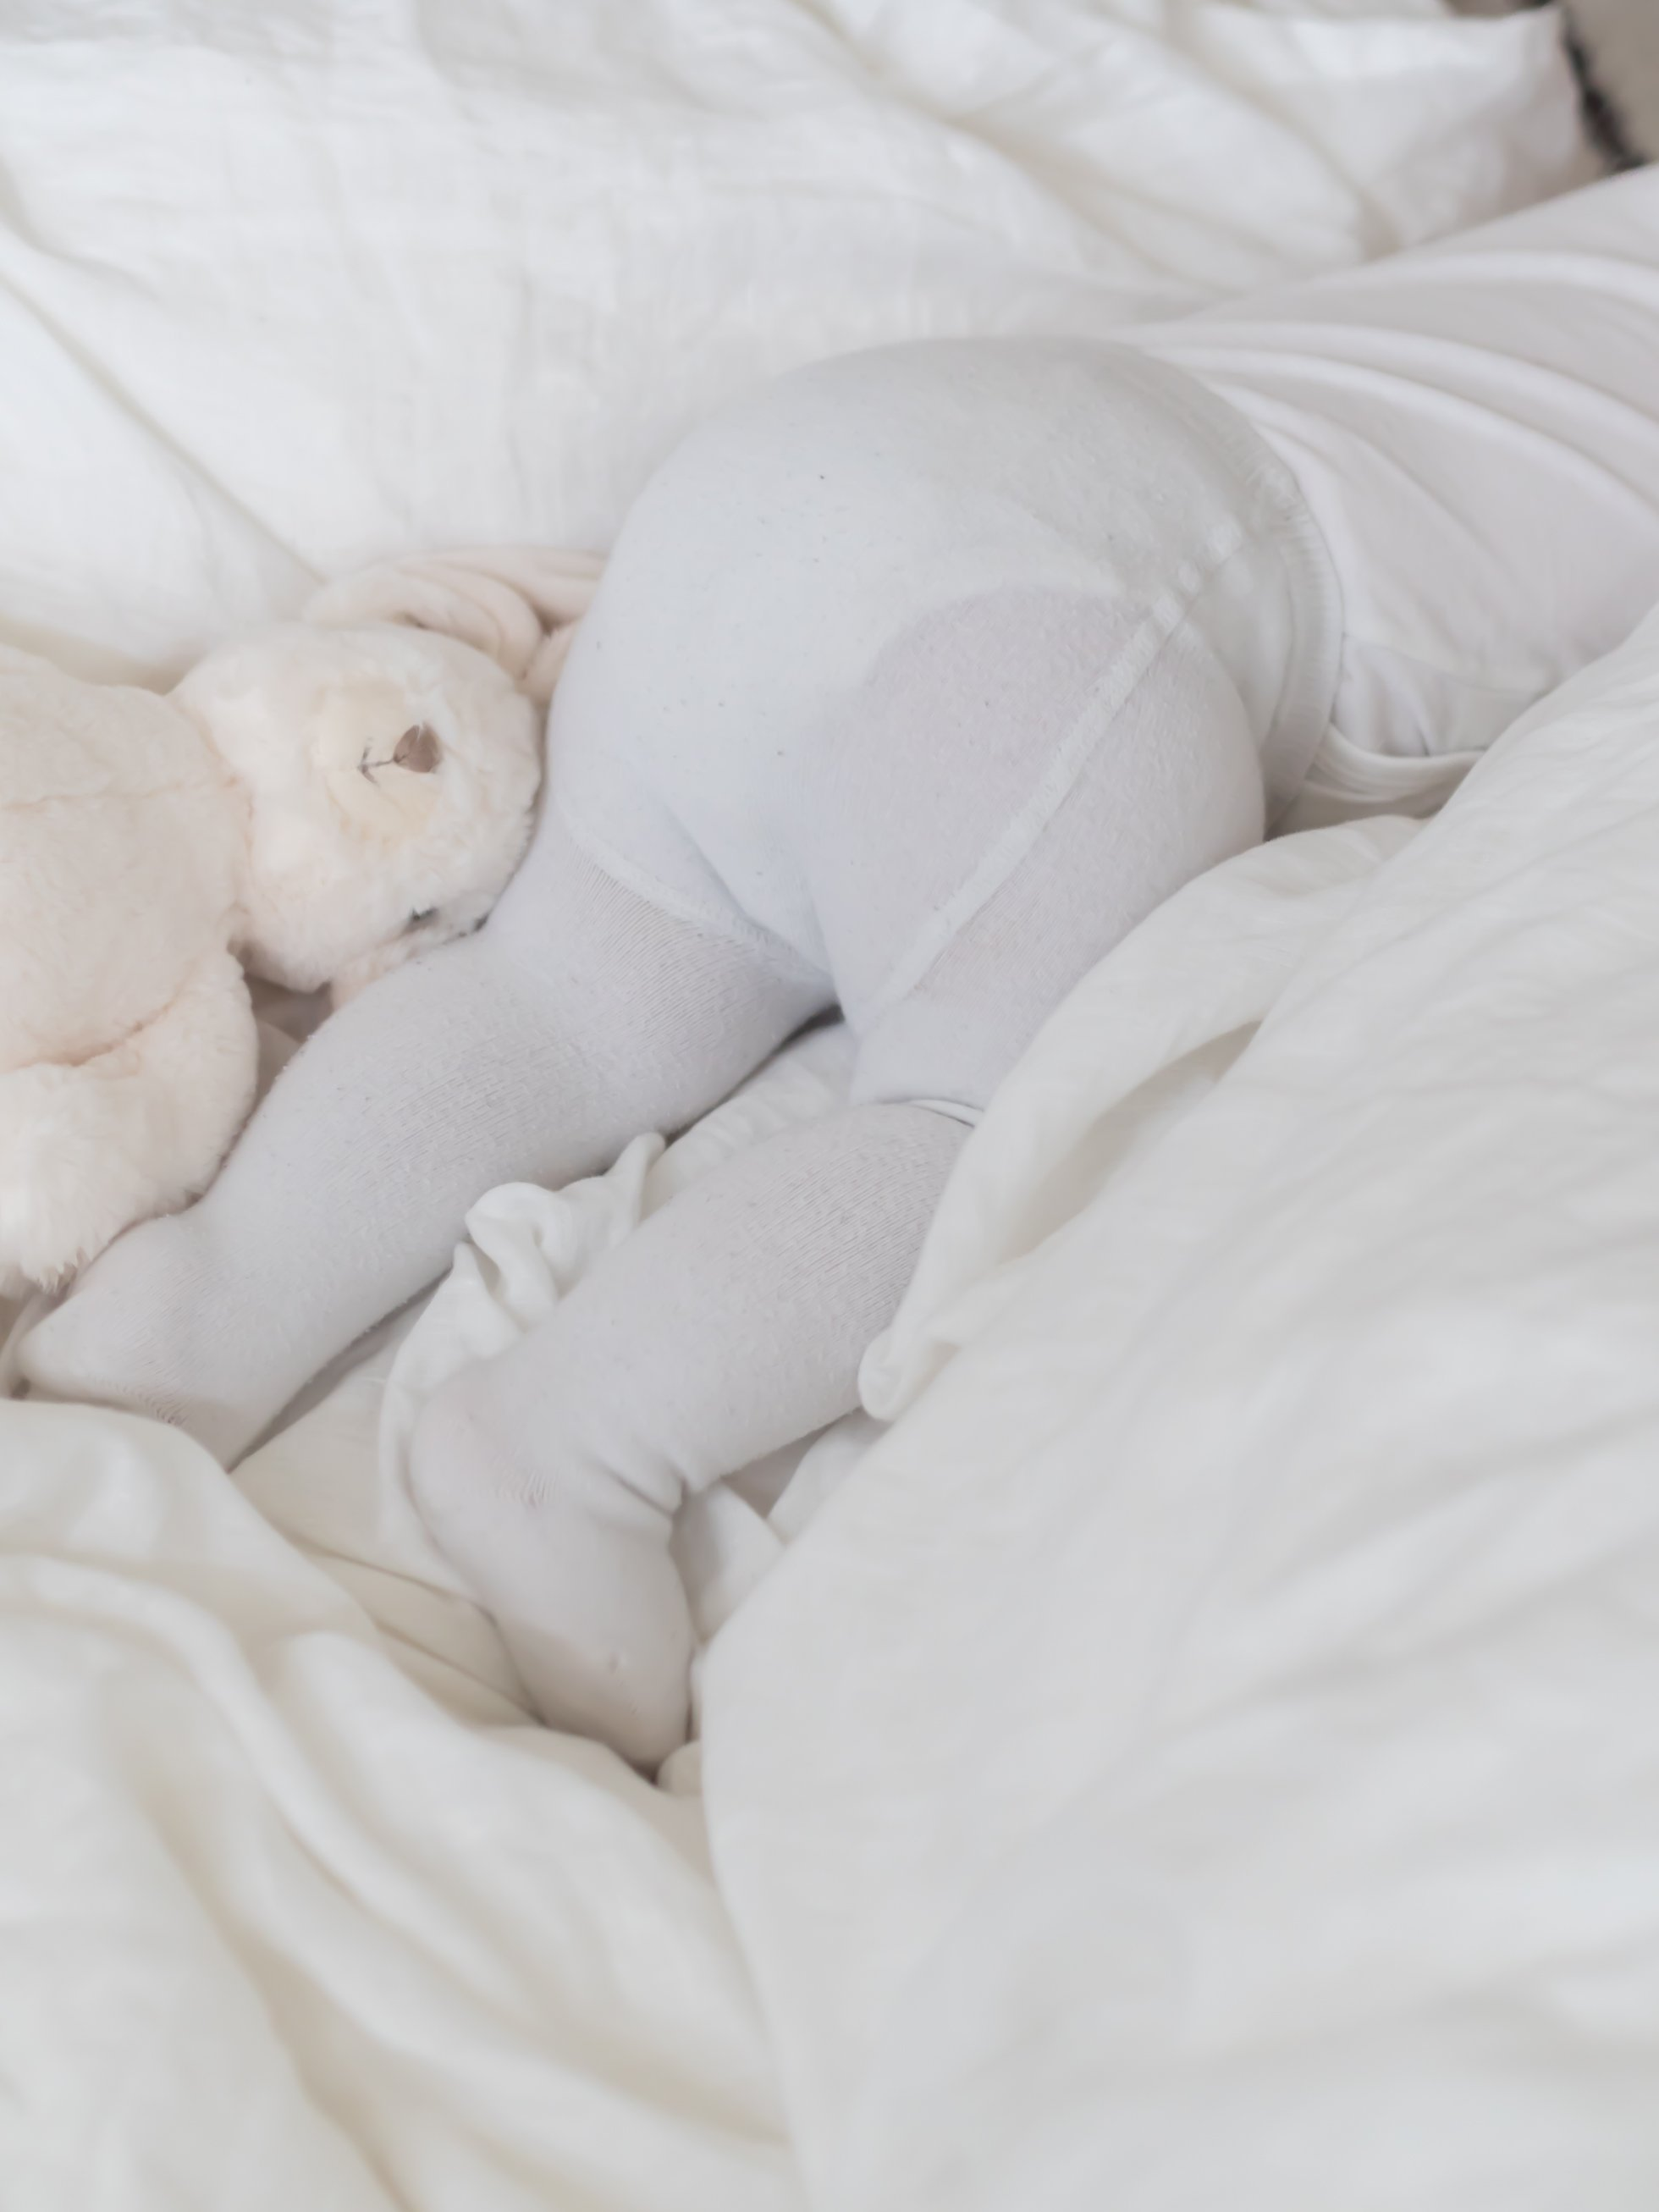 8 x suosikki vauvanvaate / Libero Softness Guarantee @monasdailystyle